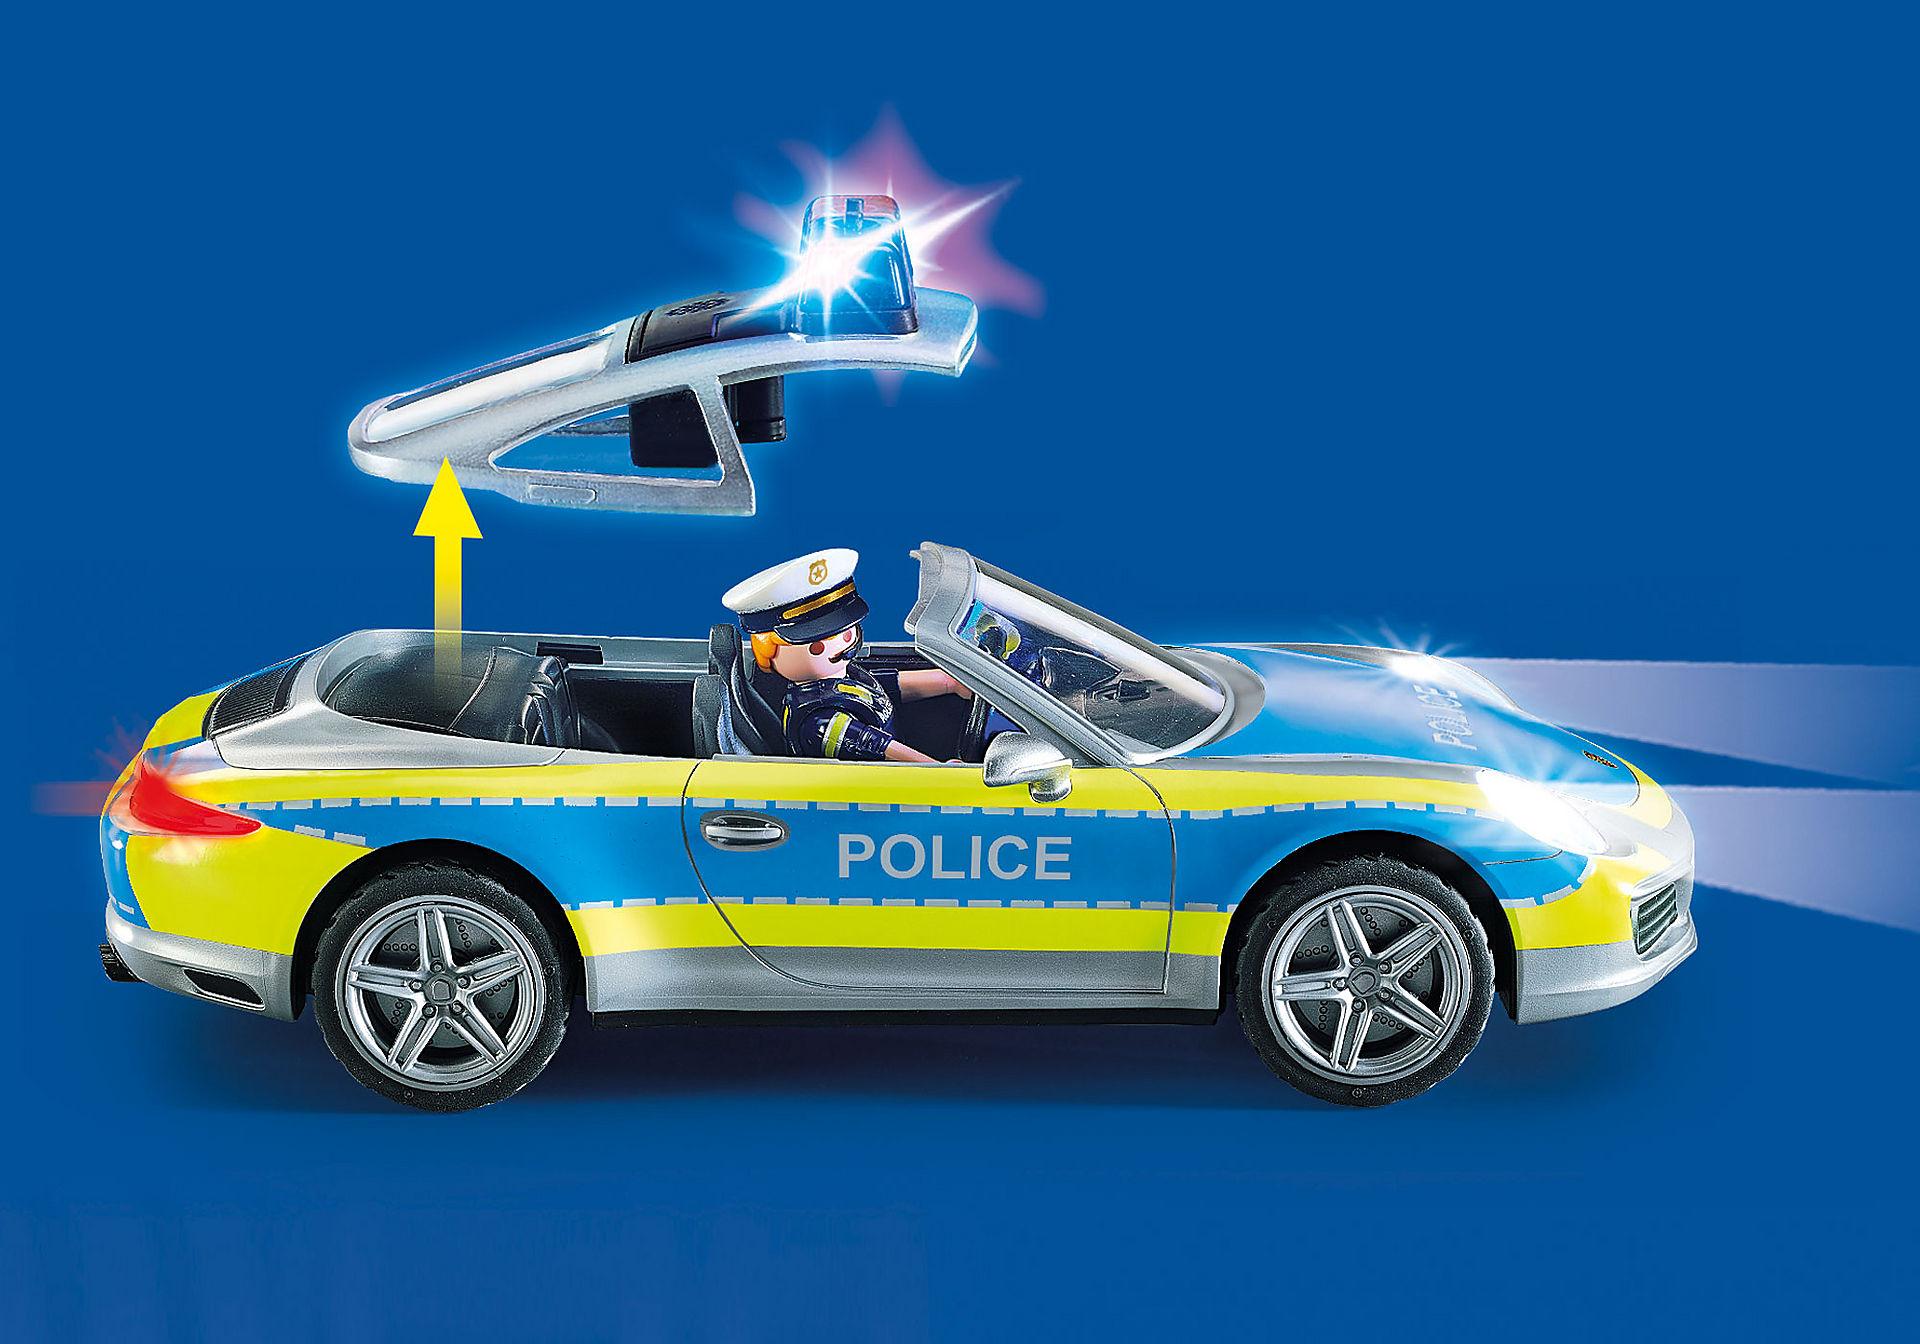 70066 Porsche 911 Carrera 4S Αστυνομικό όχημα zoom image4